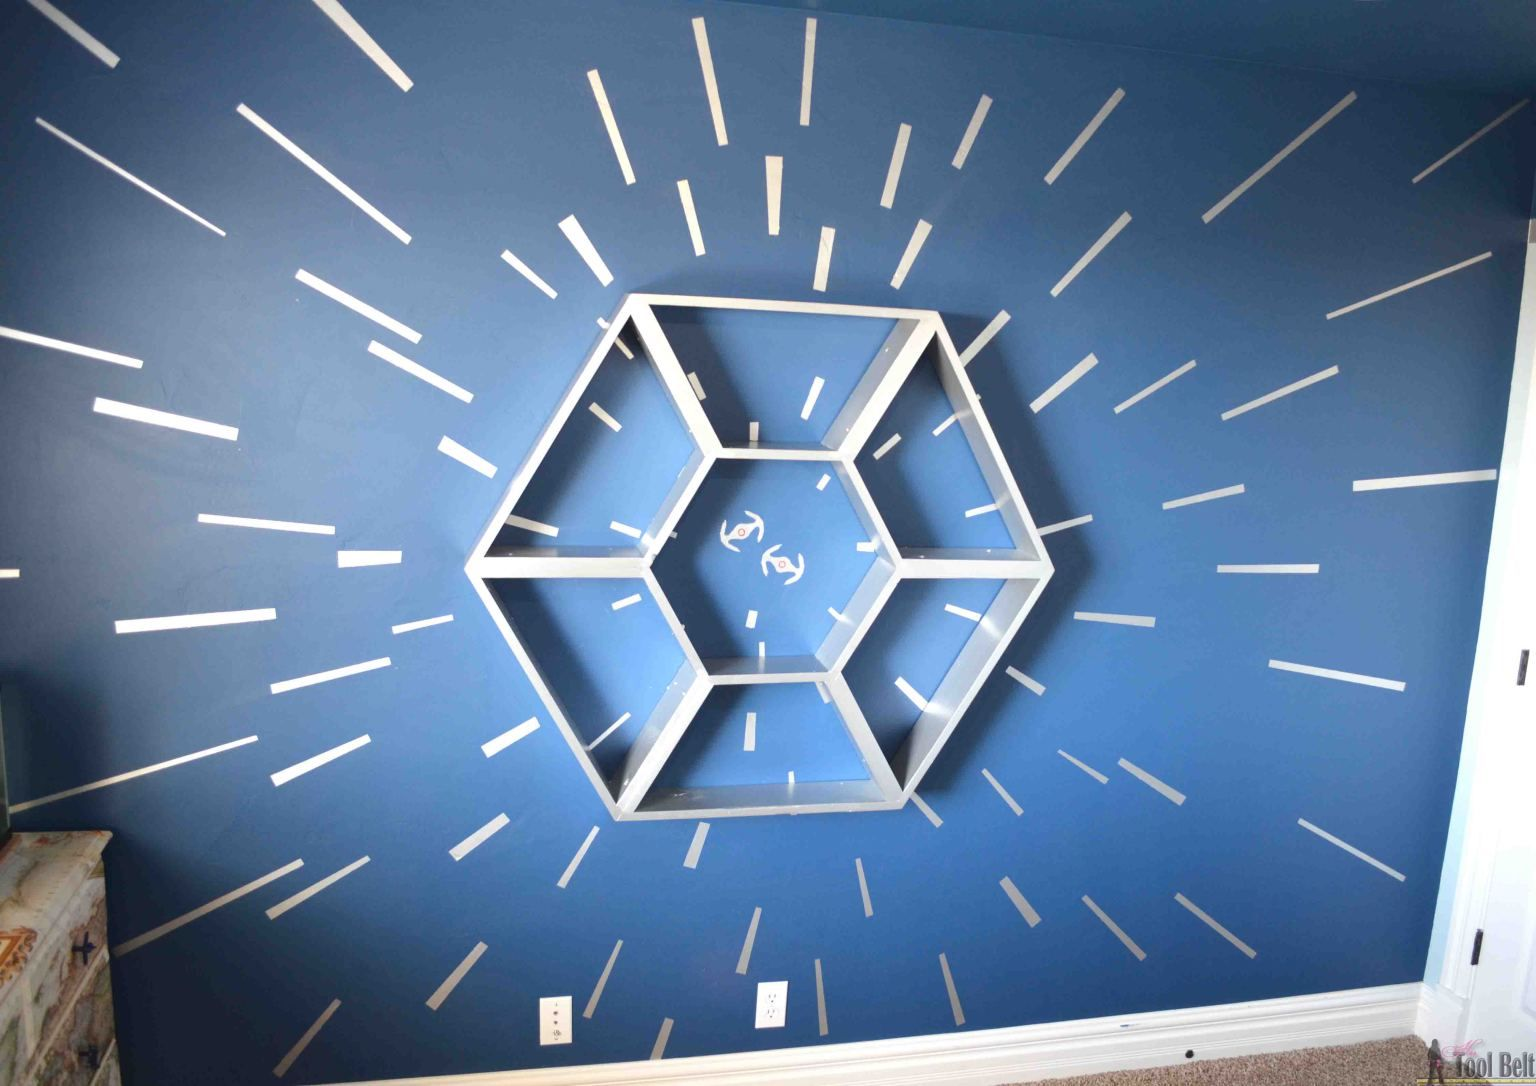 Star Wars Shelf and Hyperspace Wall | Walls | Modern ...